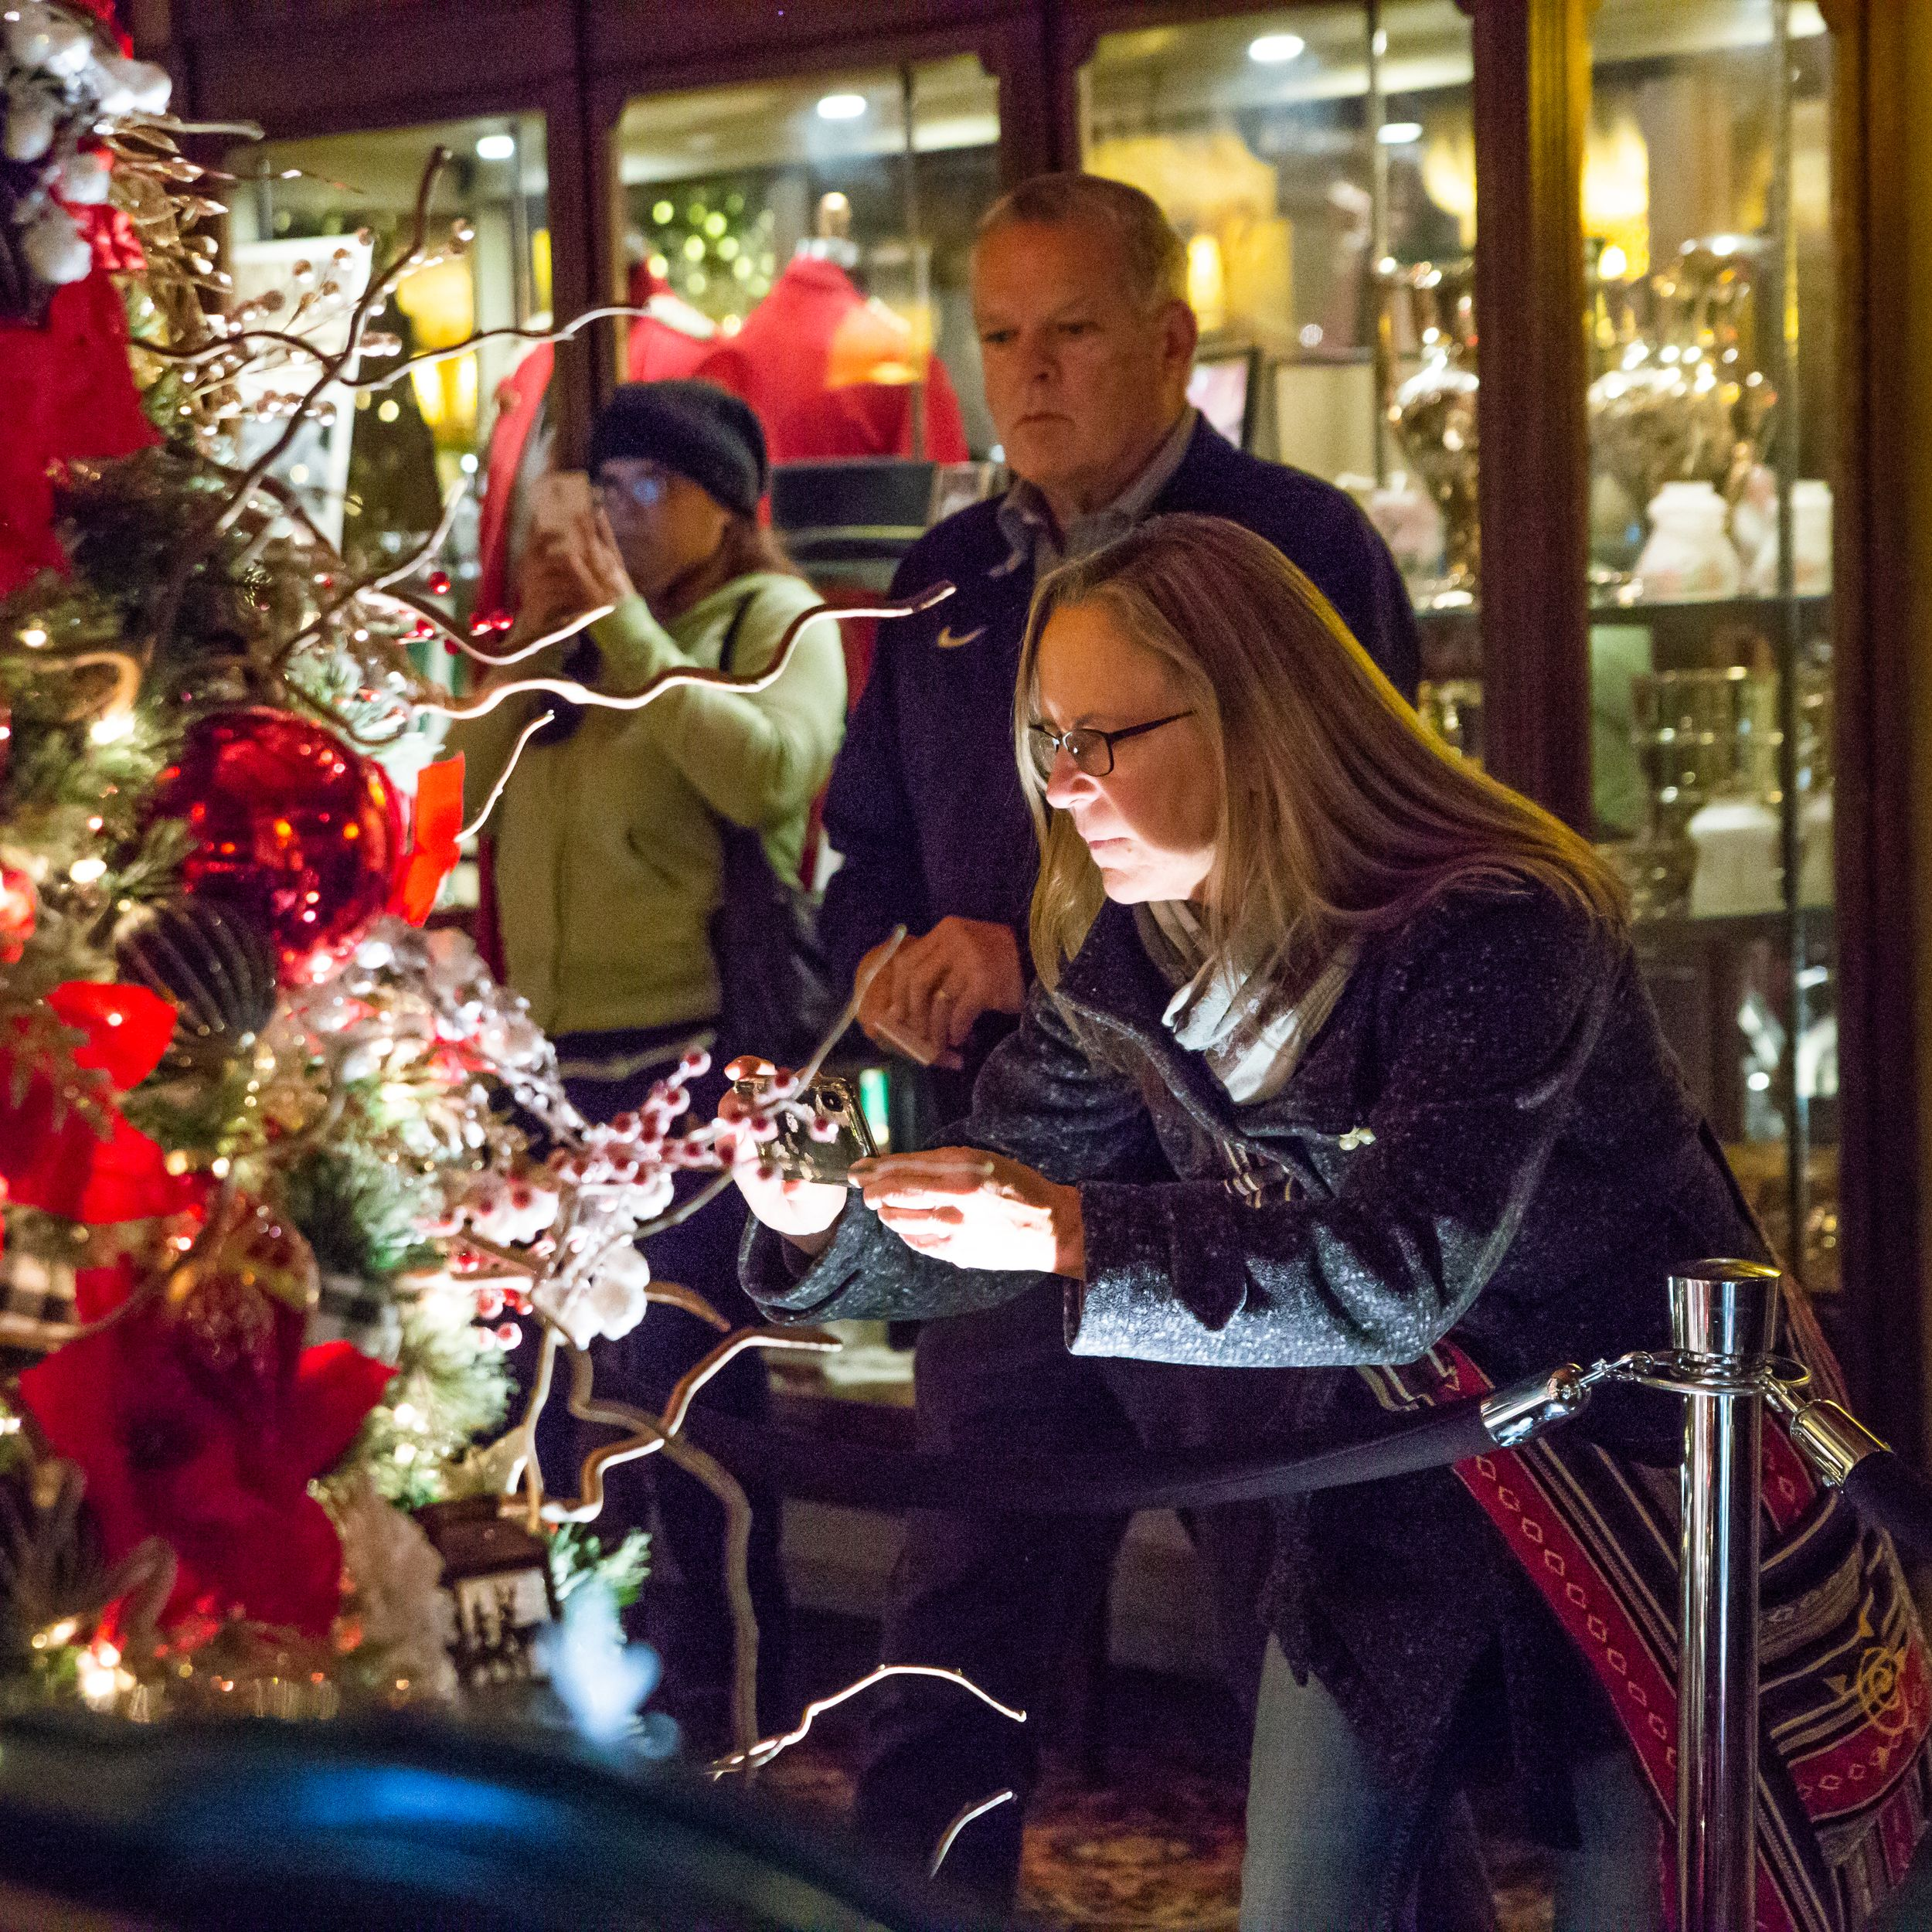 Davenport Hotel Christmas Tree Elegance 2021 Christmas Tree Elegance Postpones 2020 Event The Spokesman Review